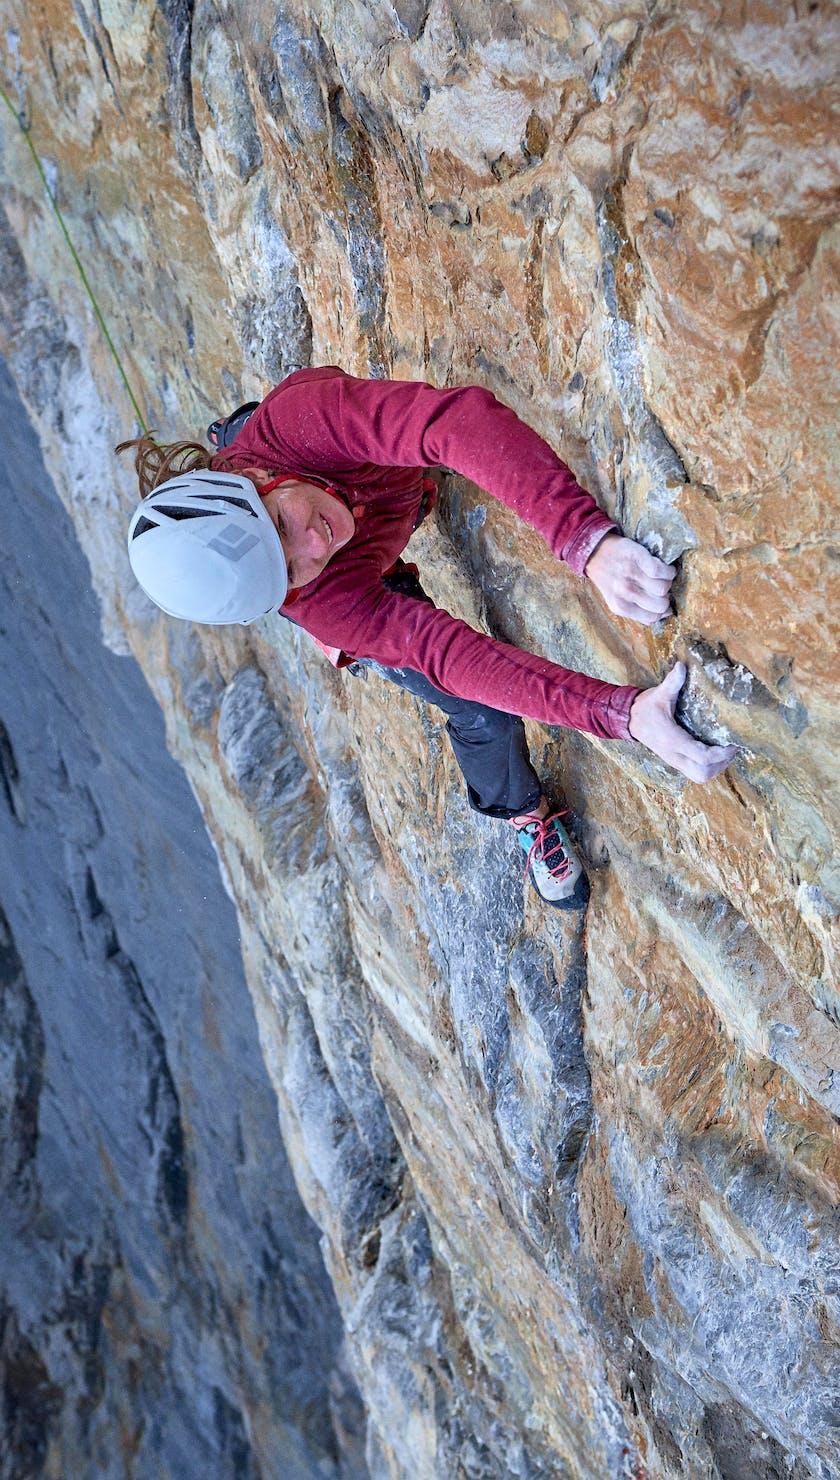 Black Diamond athlete Babsi Zangerl climbing Odyssee 8a+ (5.13c) on the Eiger